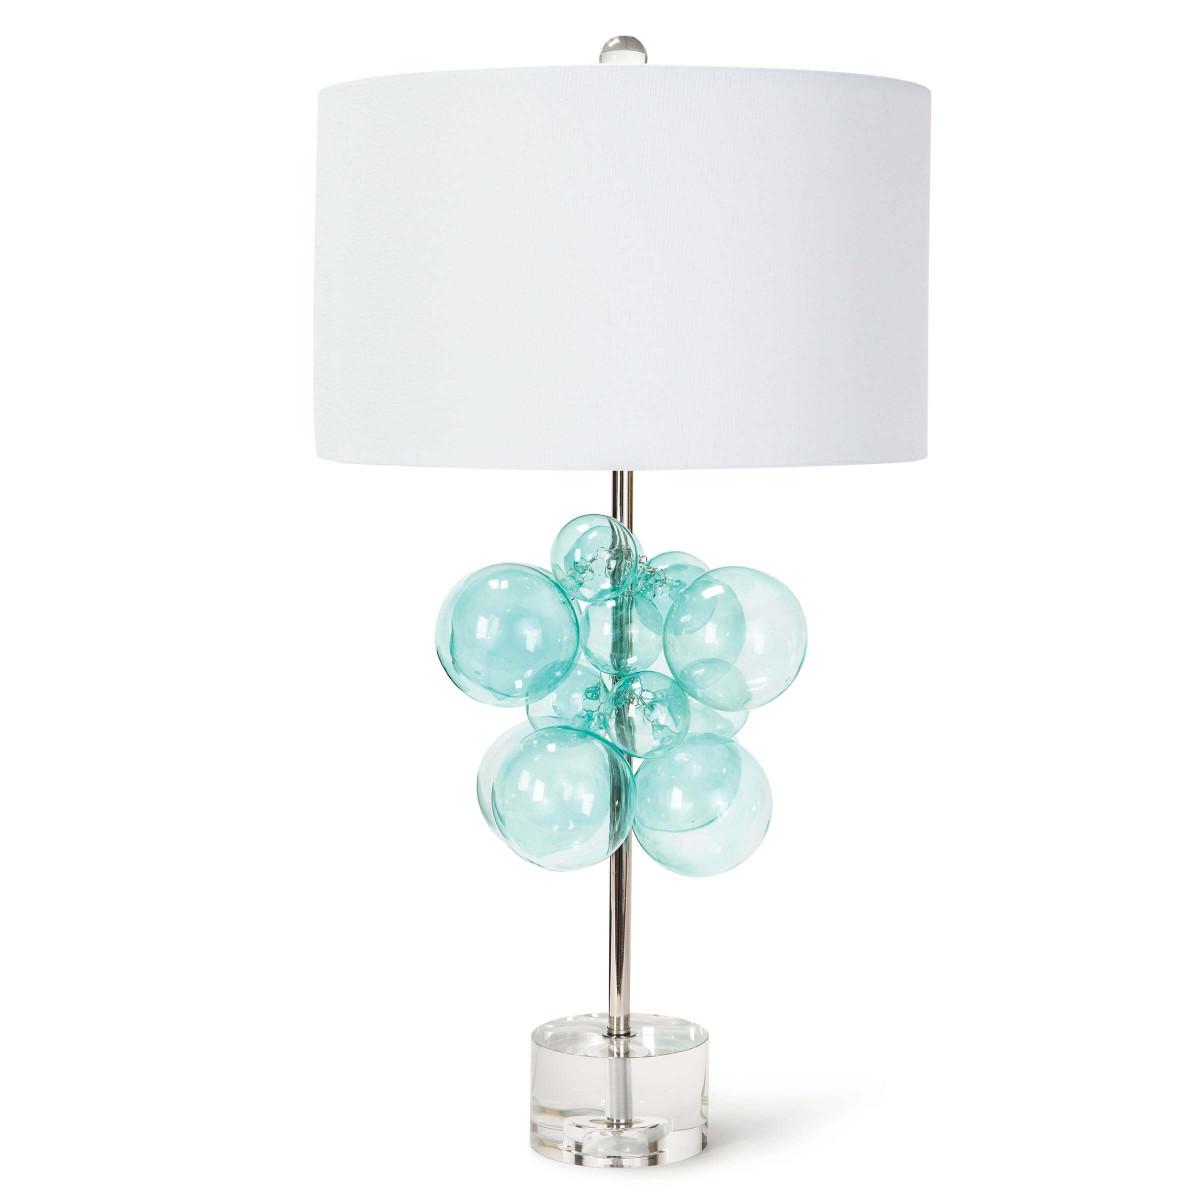 Aqua Balloons Lamp-$465.00